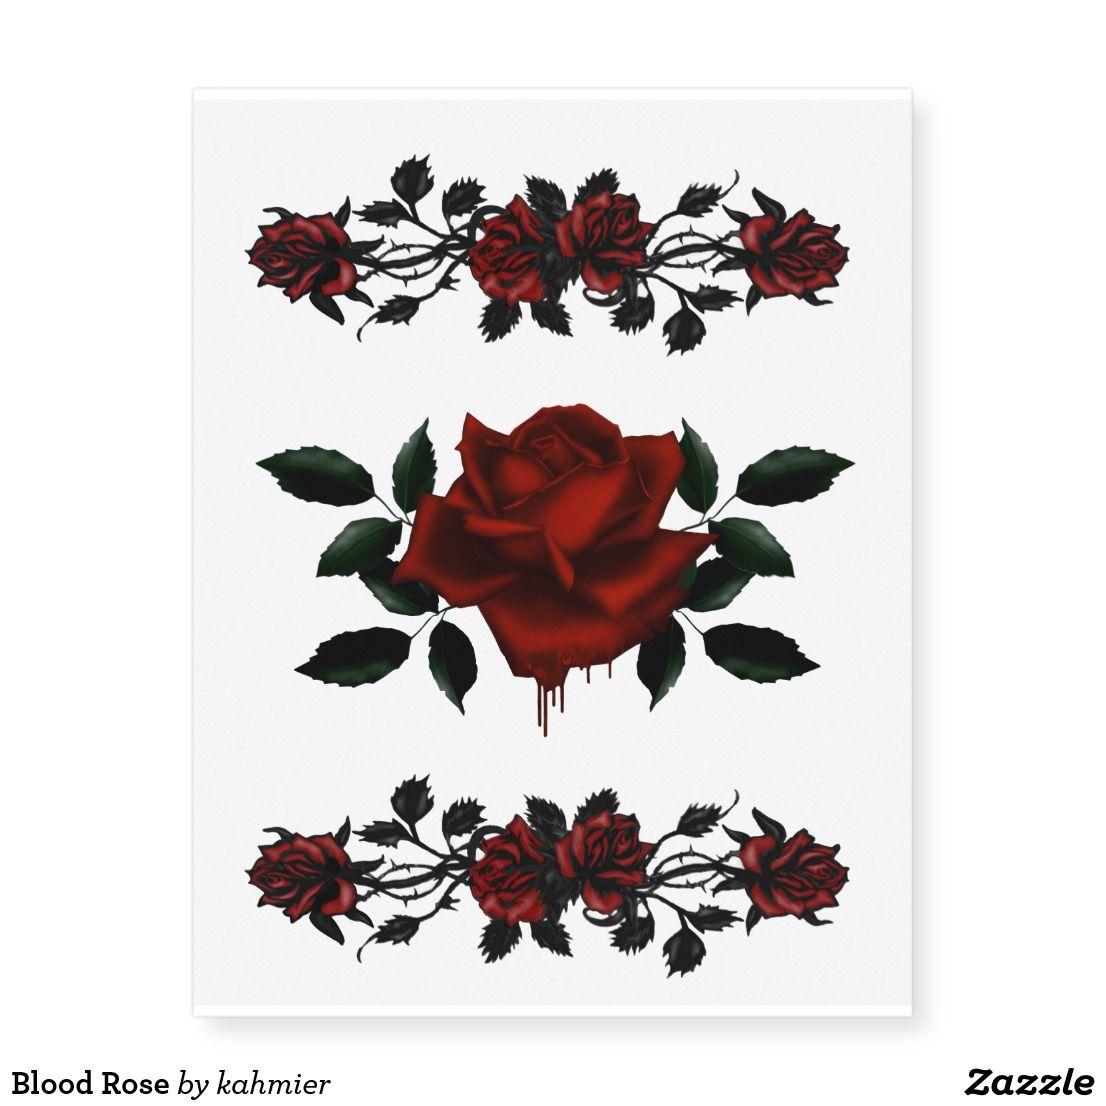 Blood Rose Temporary Tattoos | Zazzle.com